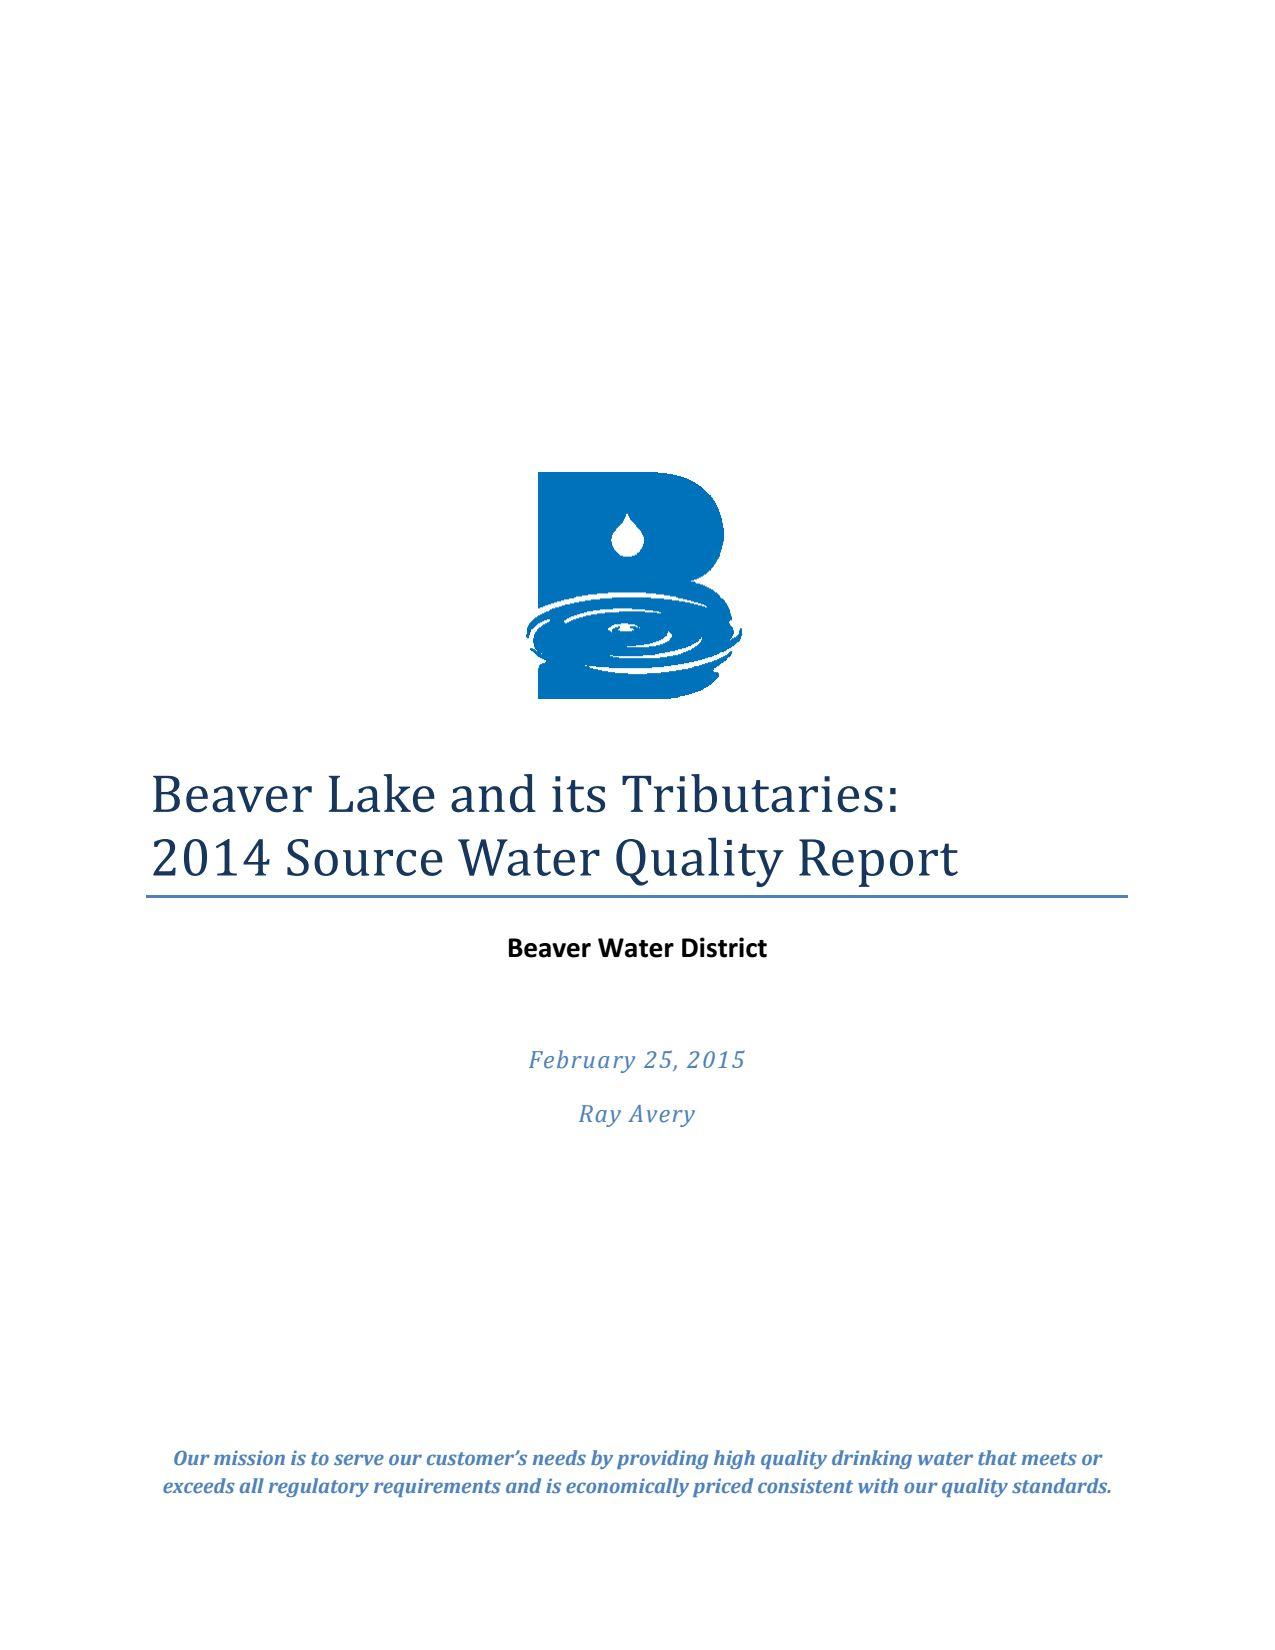 2014 Beaver Lake Water Quality Report